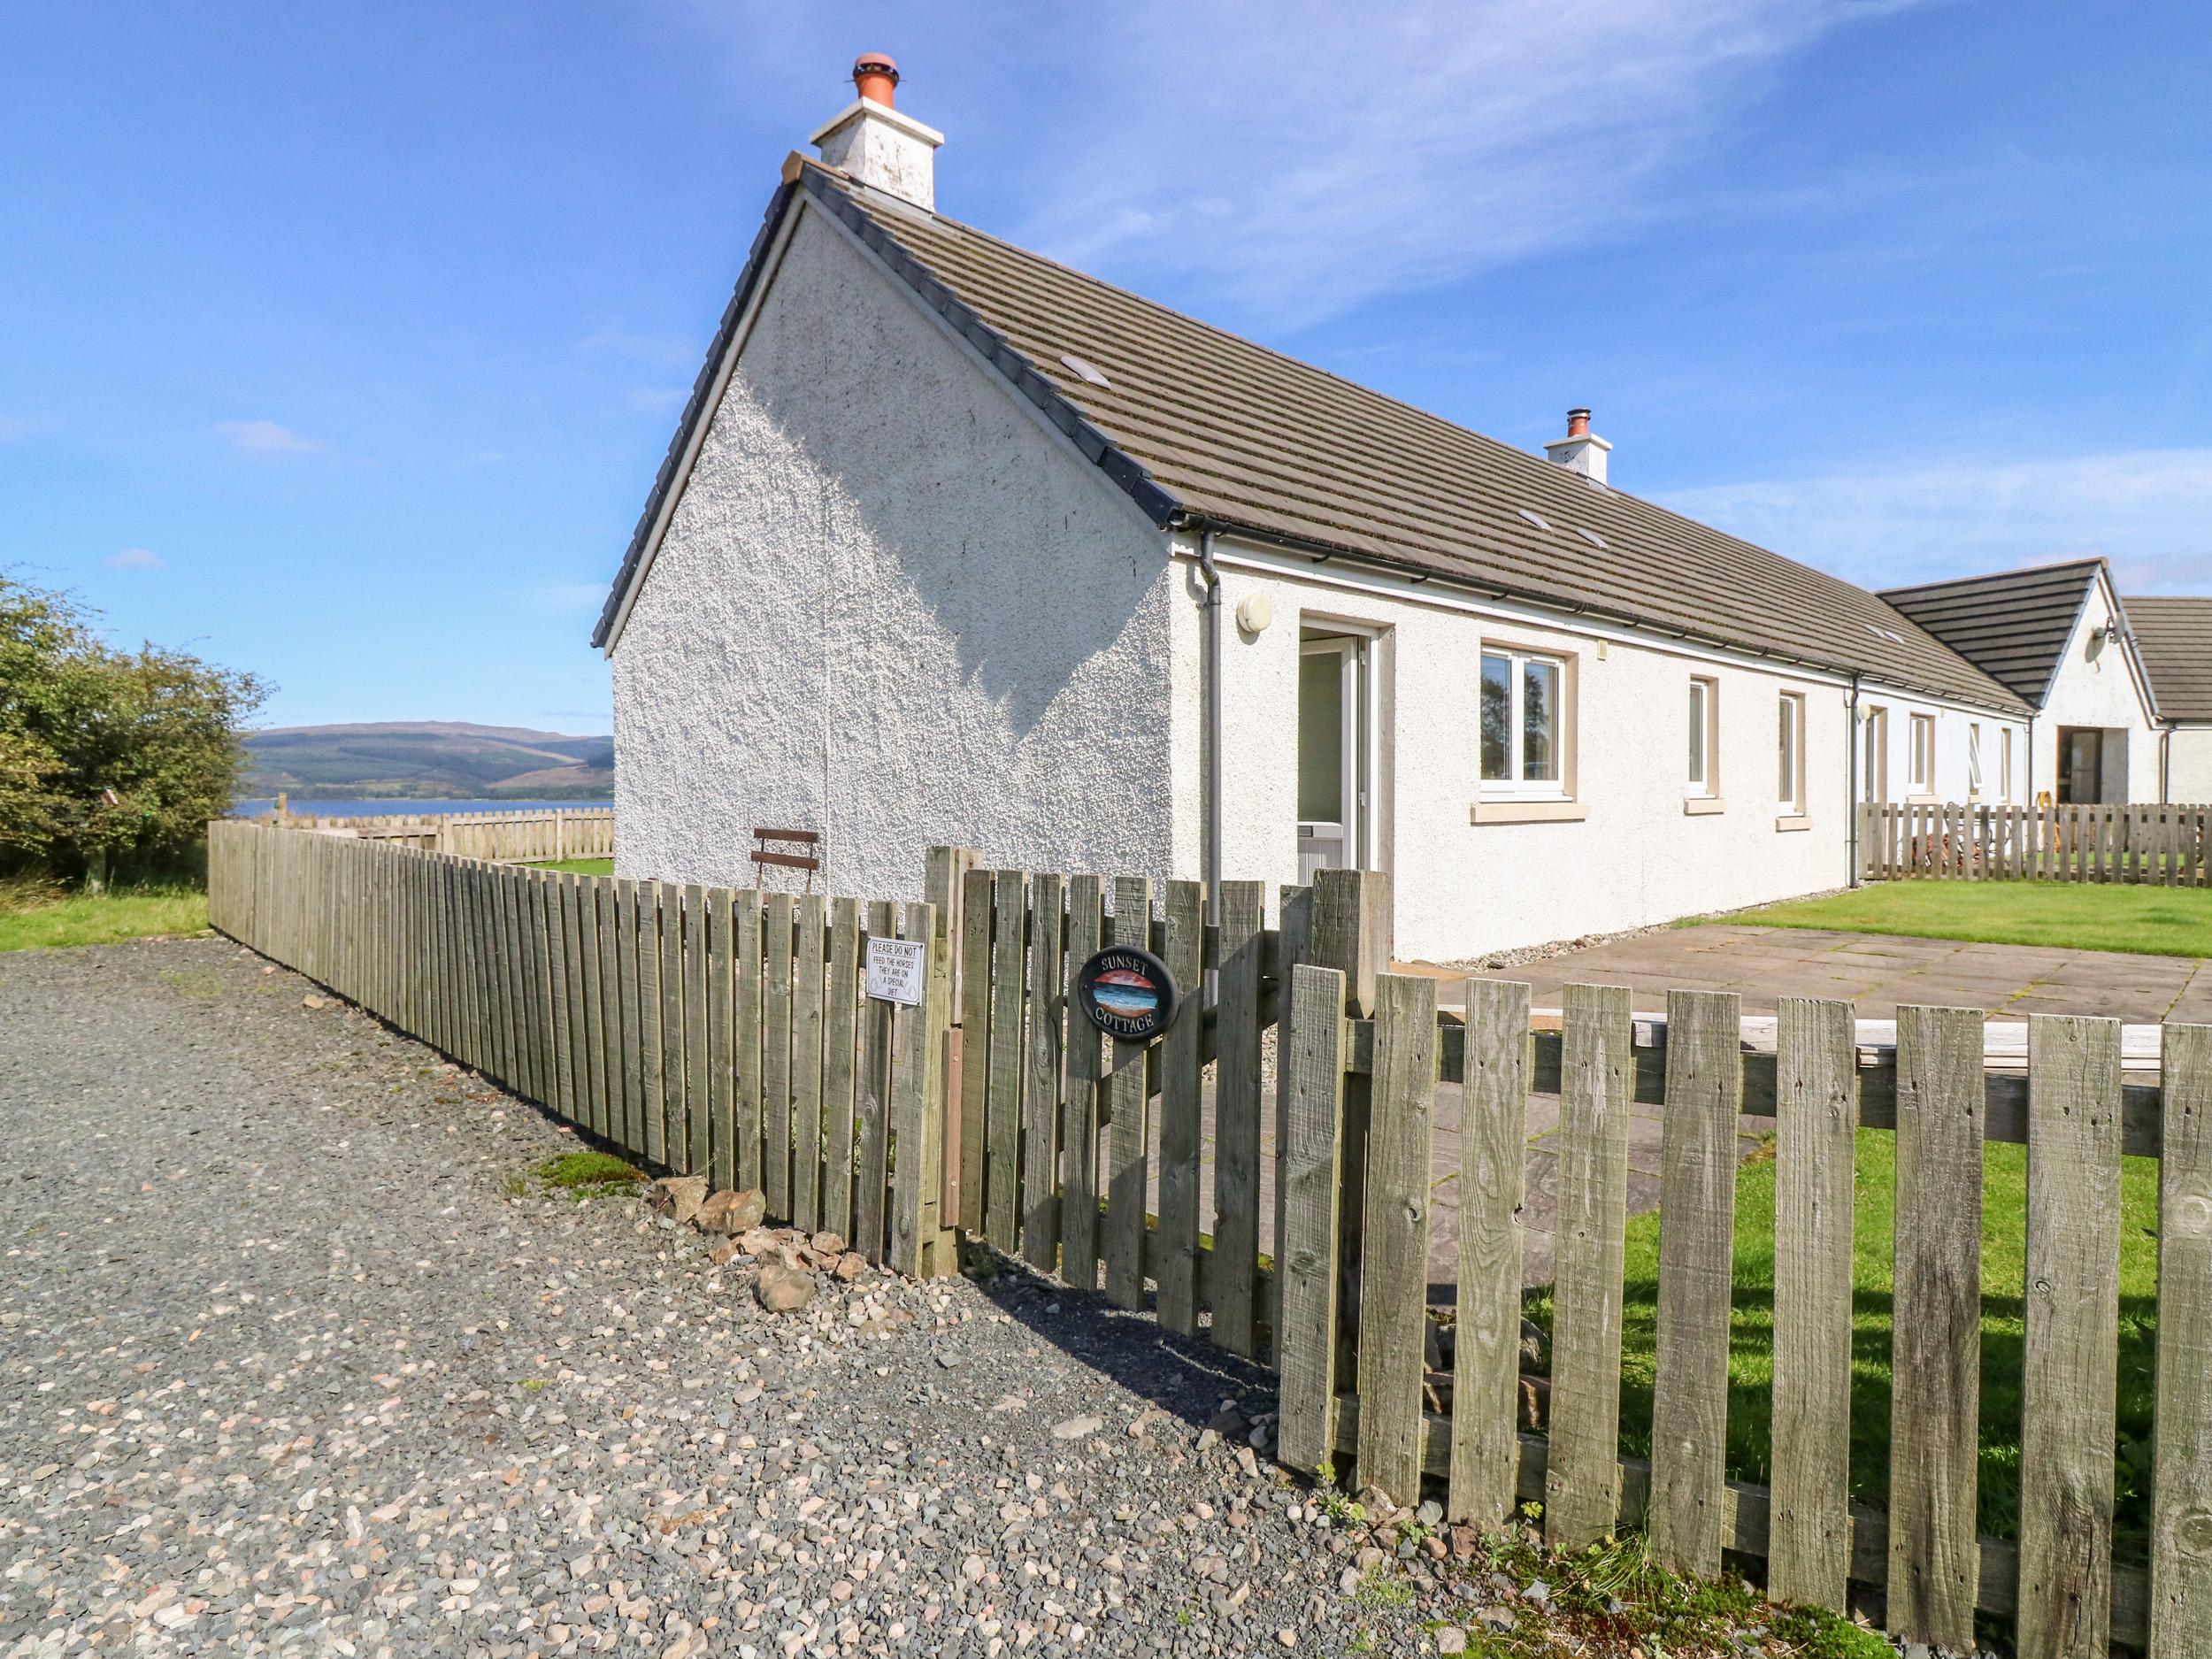 Cottage Image Title